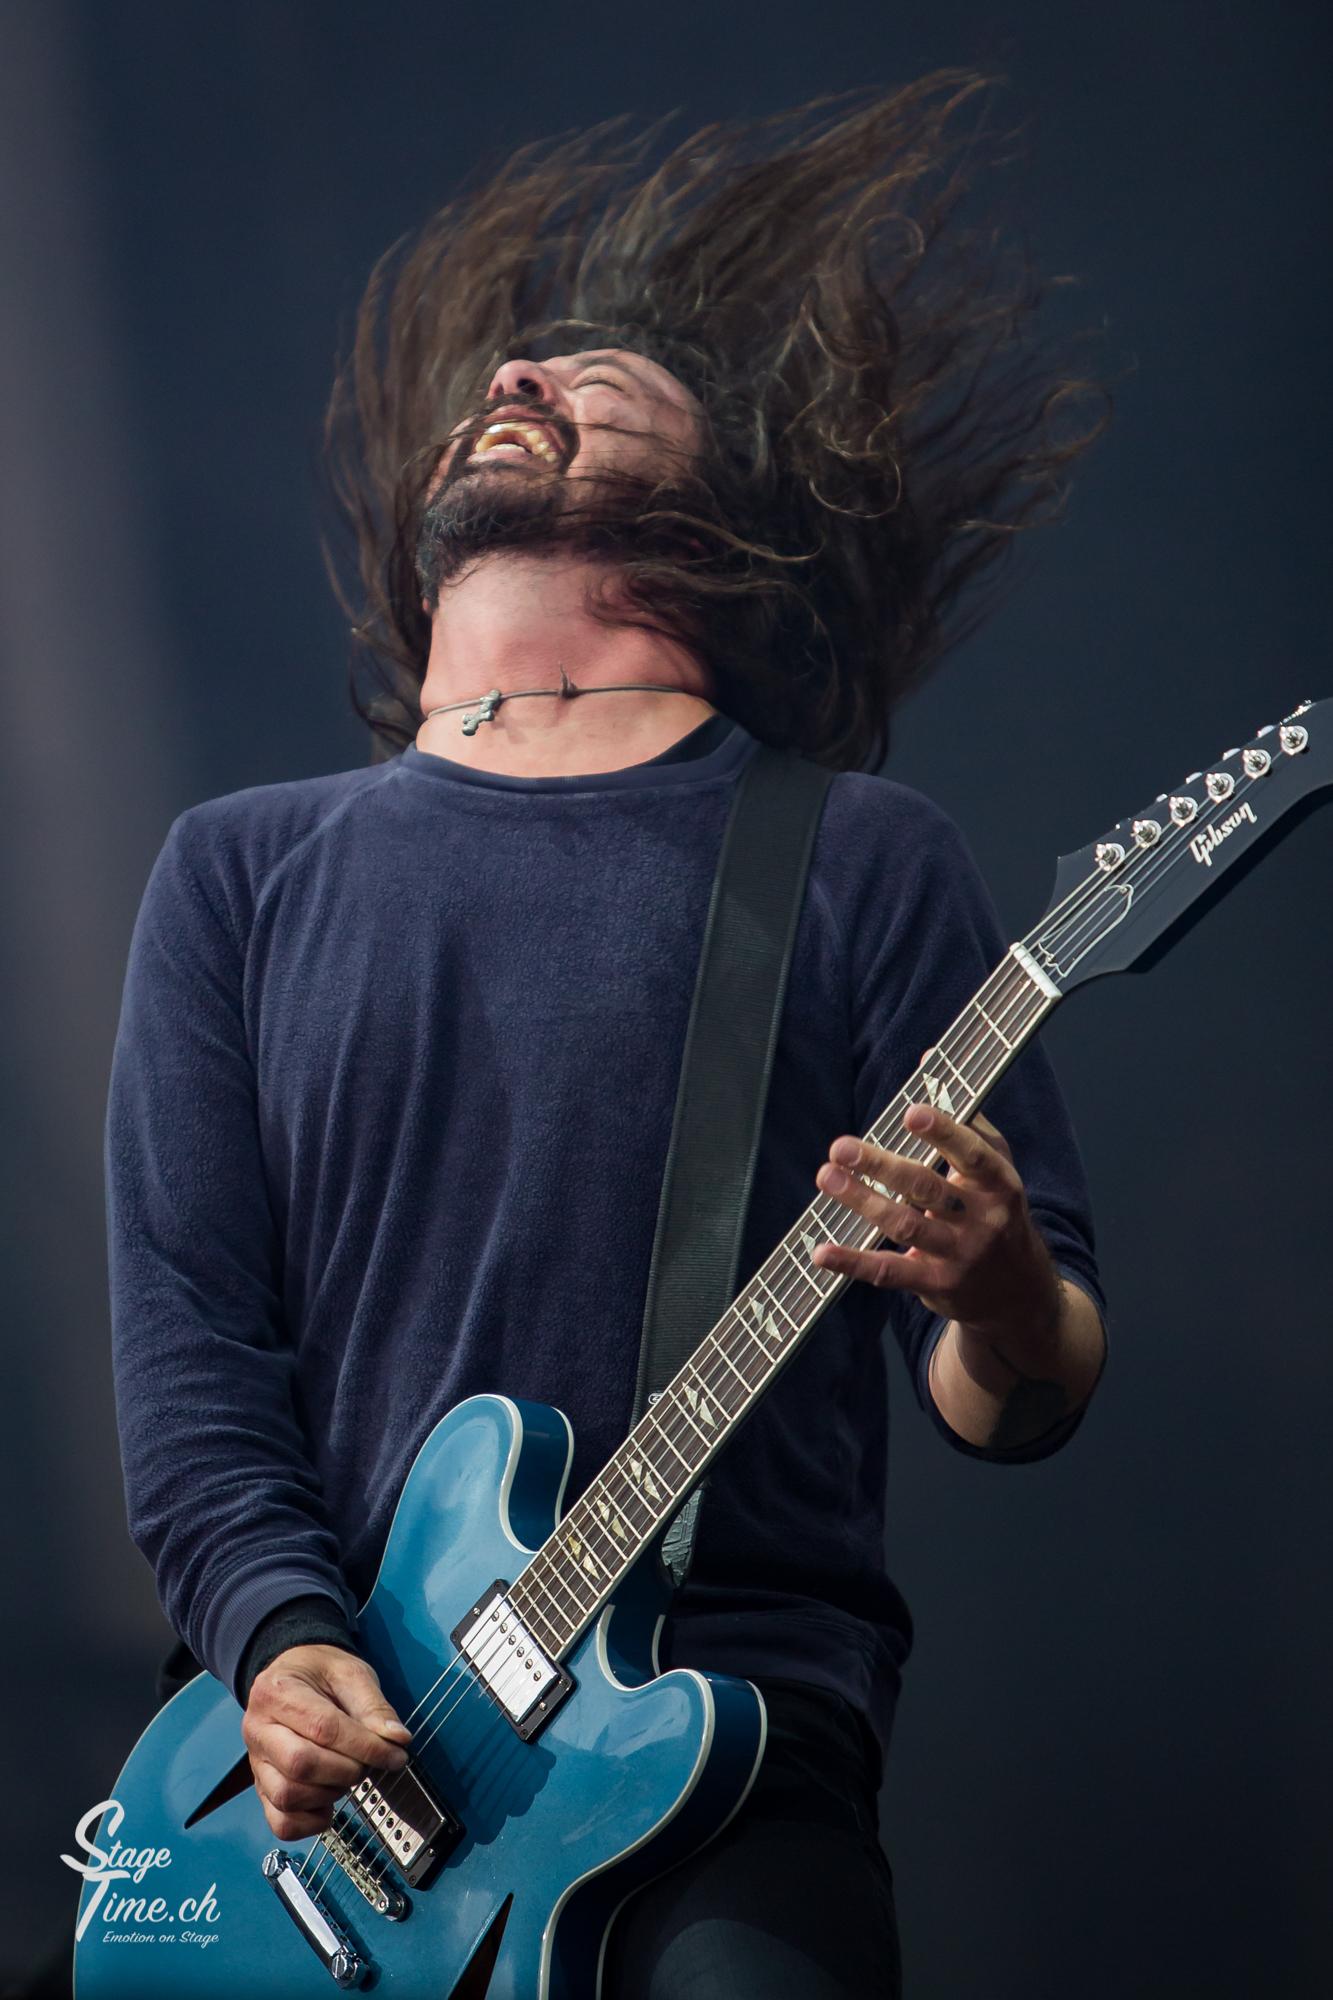 Foo_Fighters___📷_Christoph_Gurtner___stagetime.ch-8